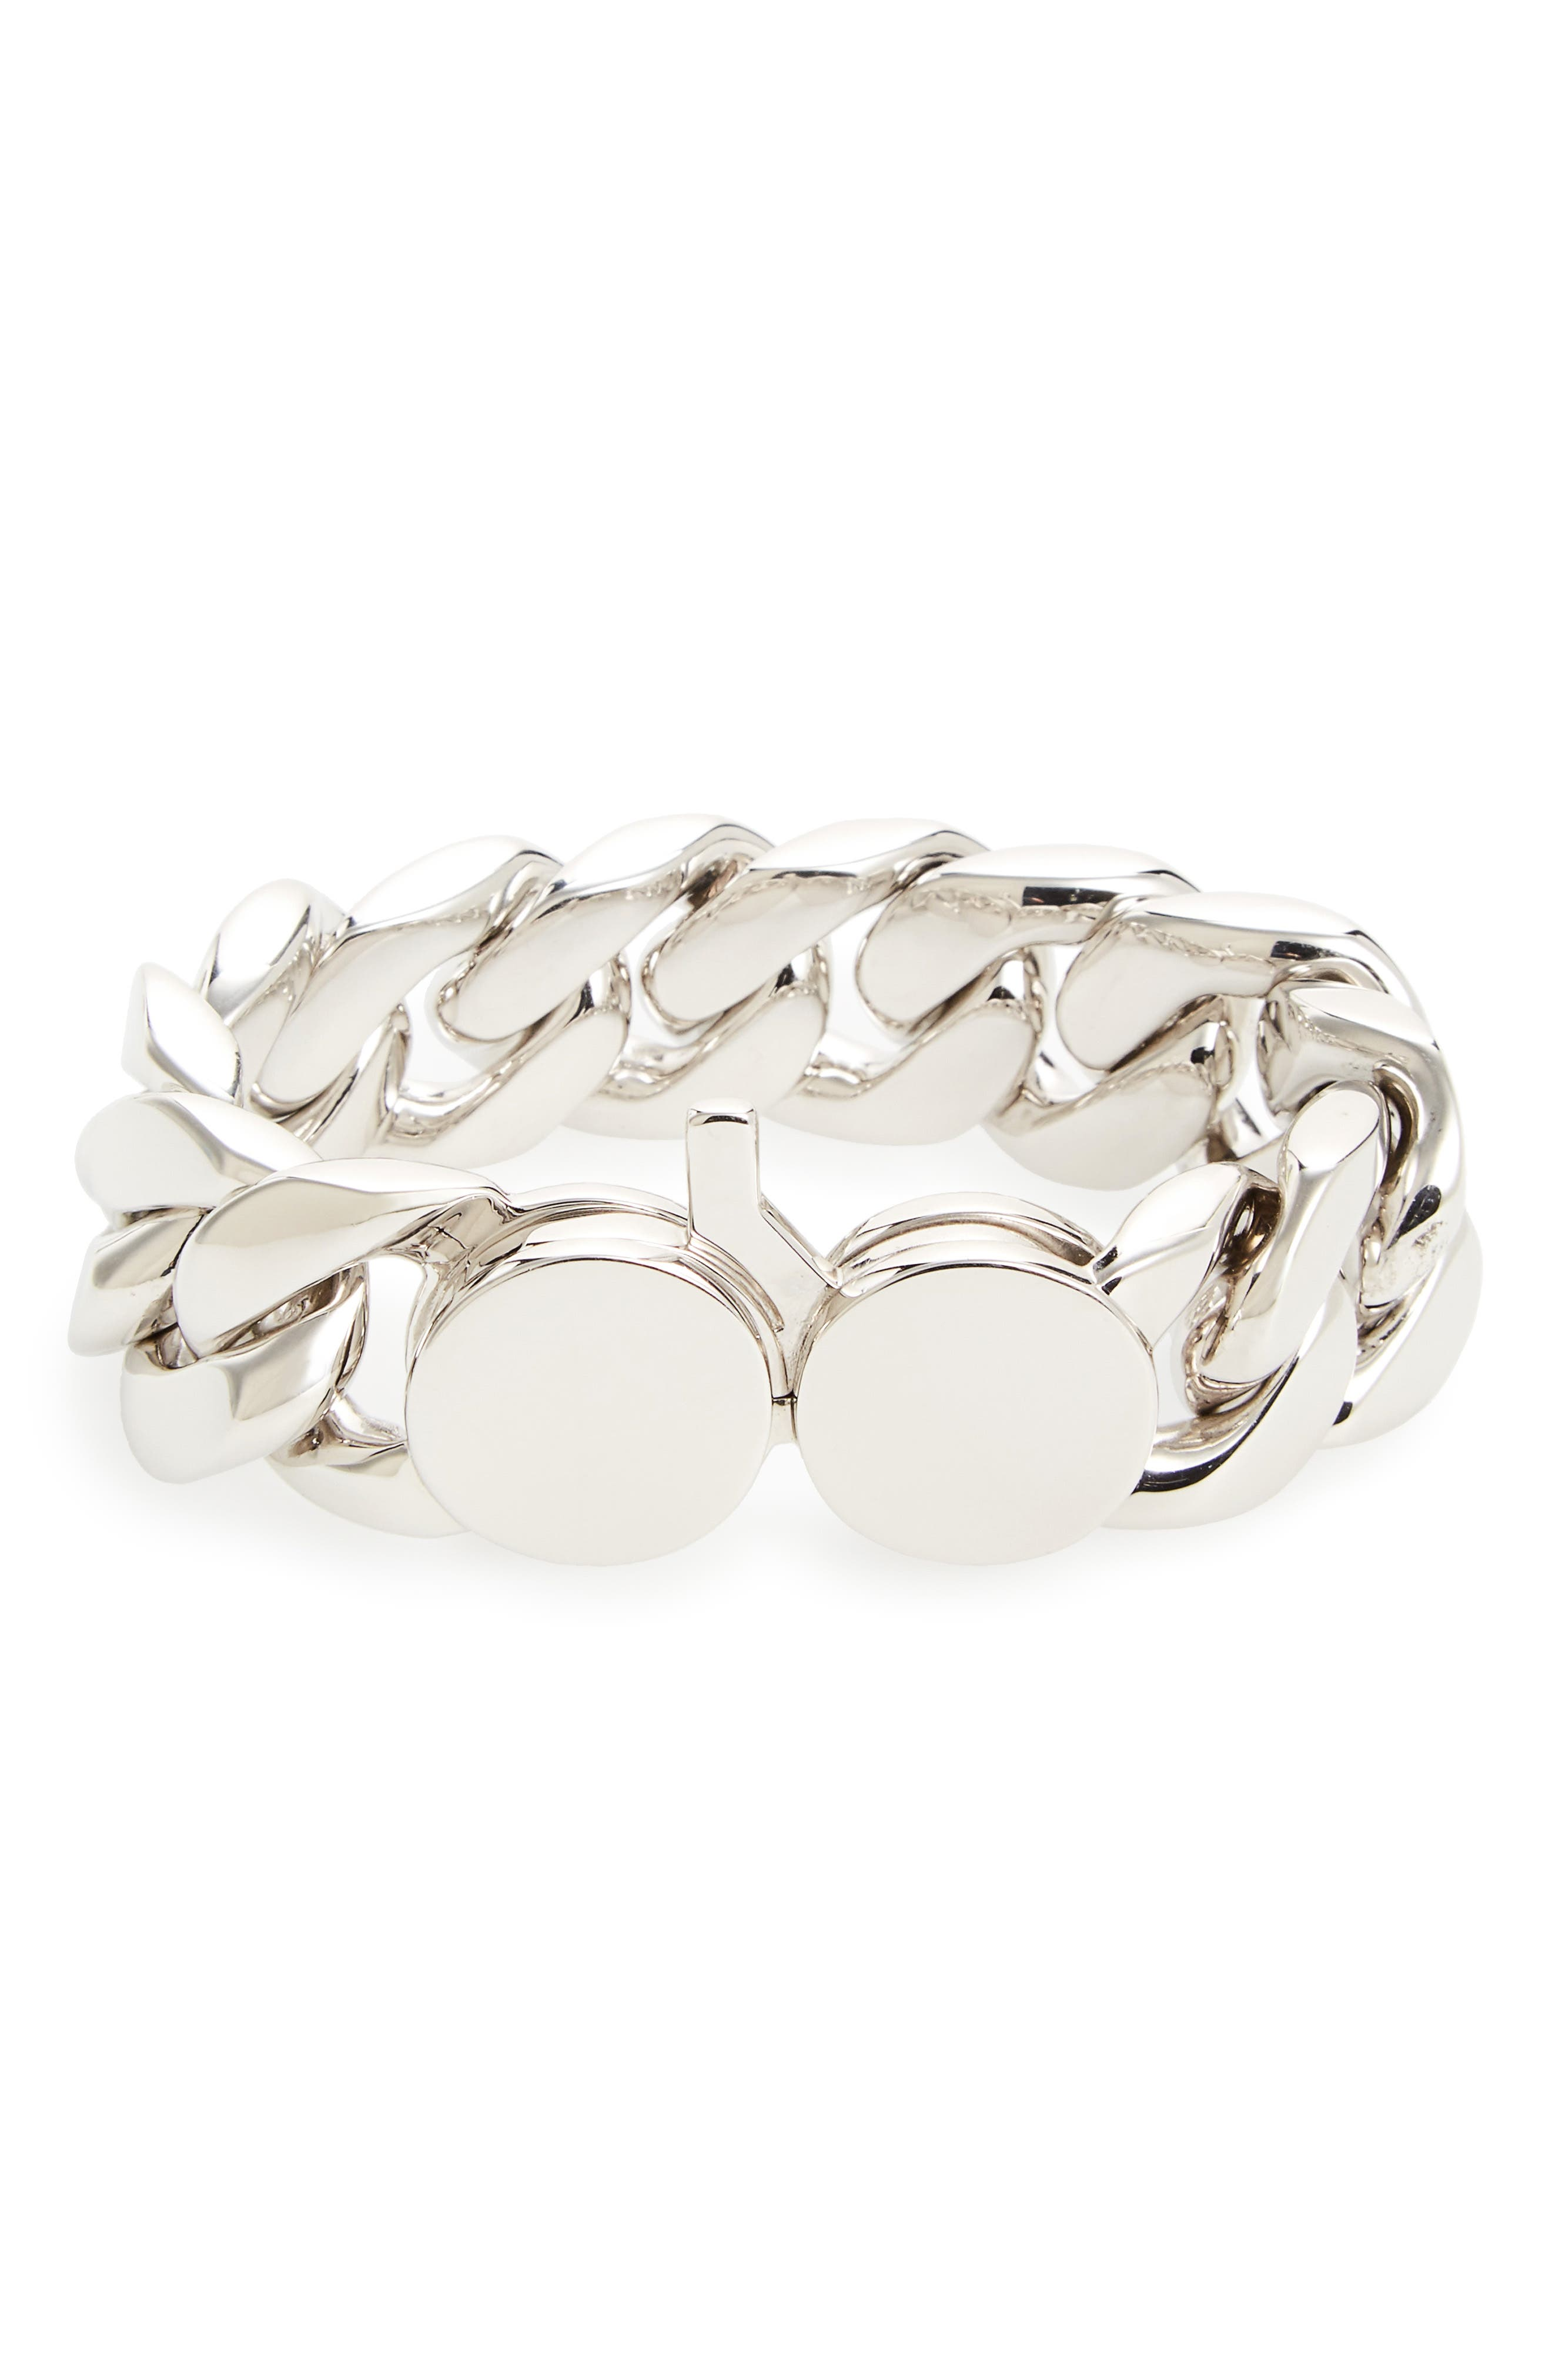 Medium Chunky Silver Chain Link Bracelet,                         Main,                         color, Silver